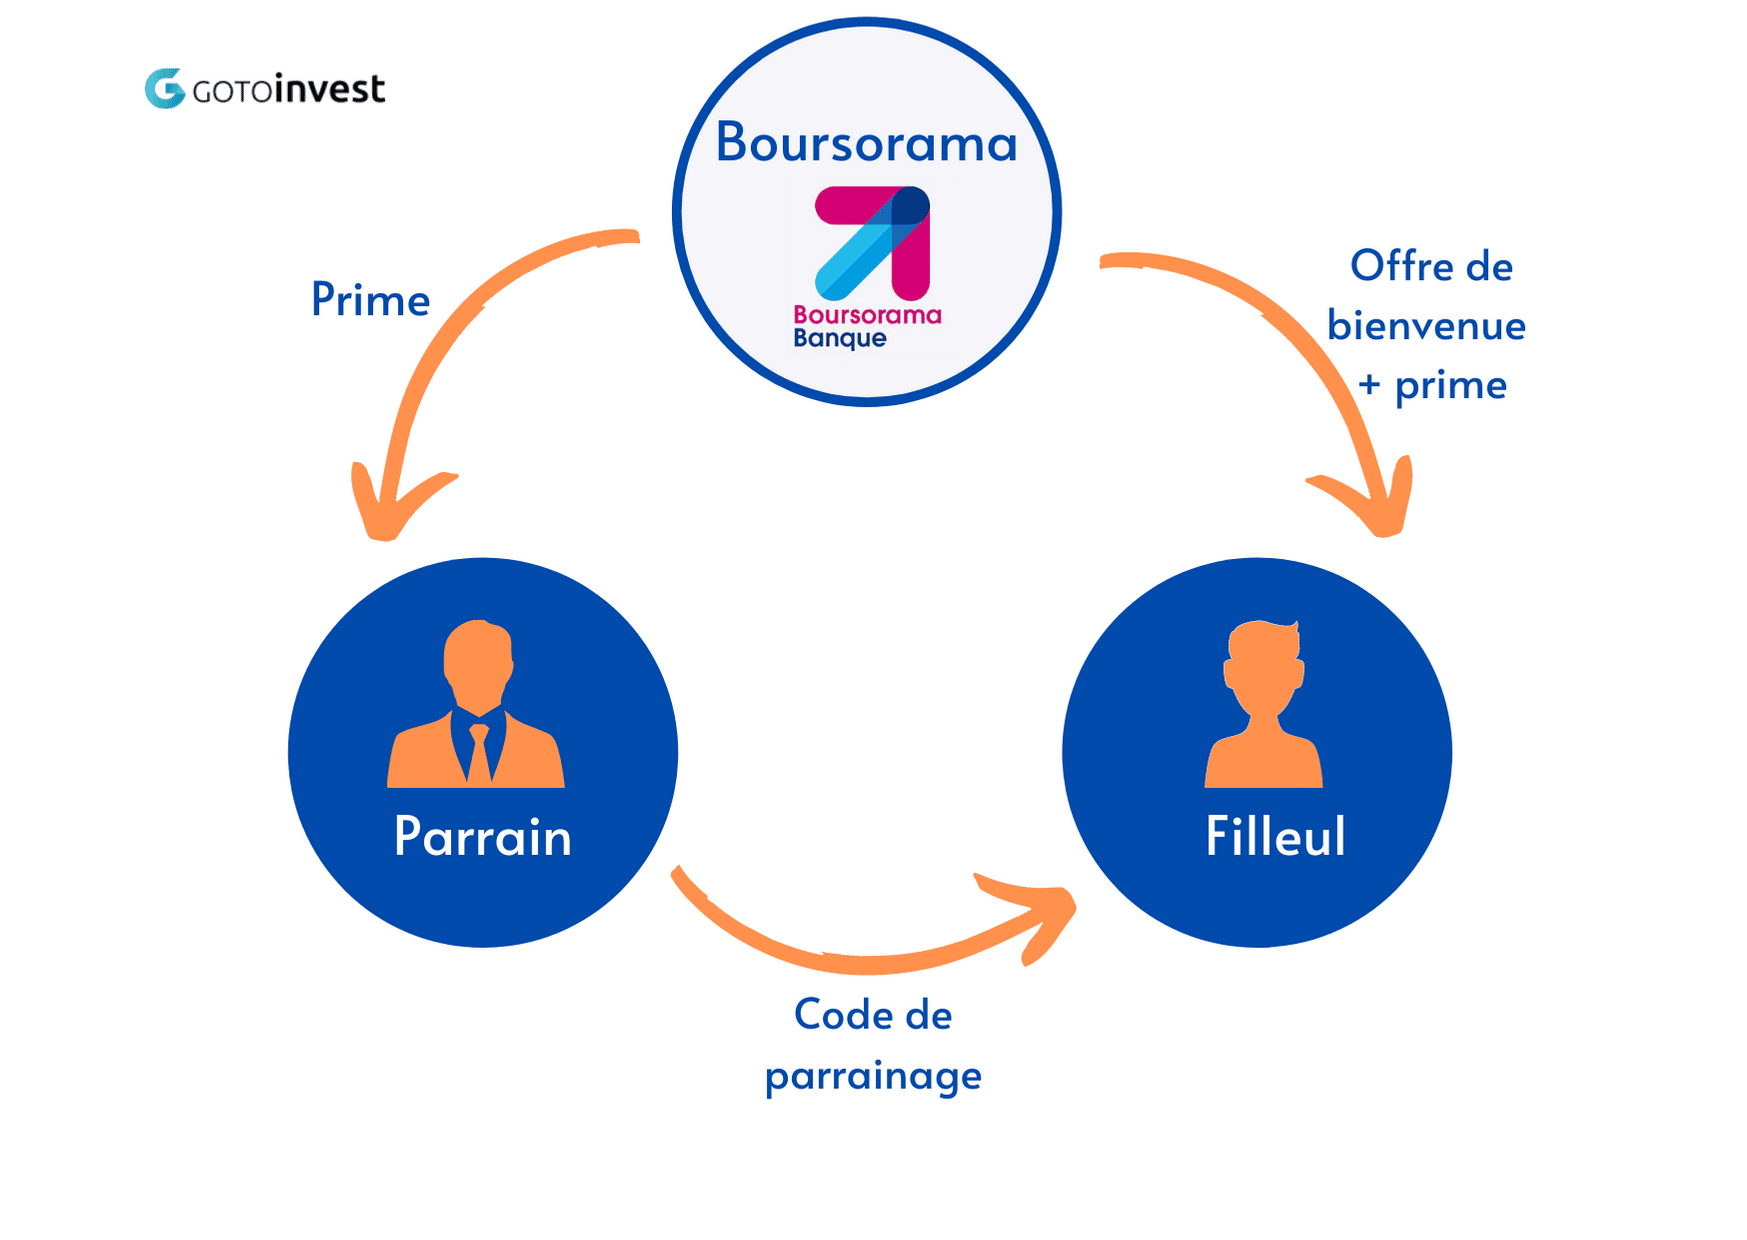 Boursorama Banque_parrainage